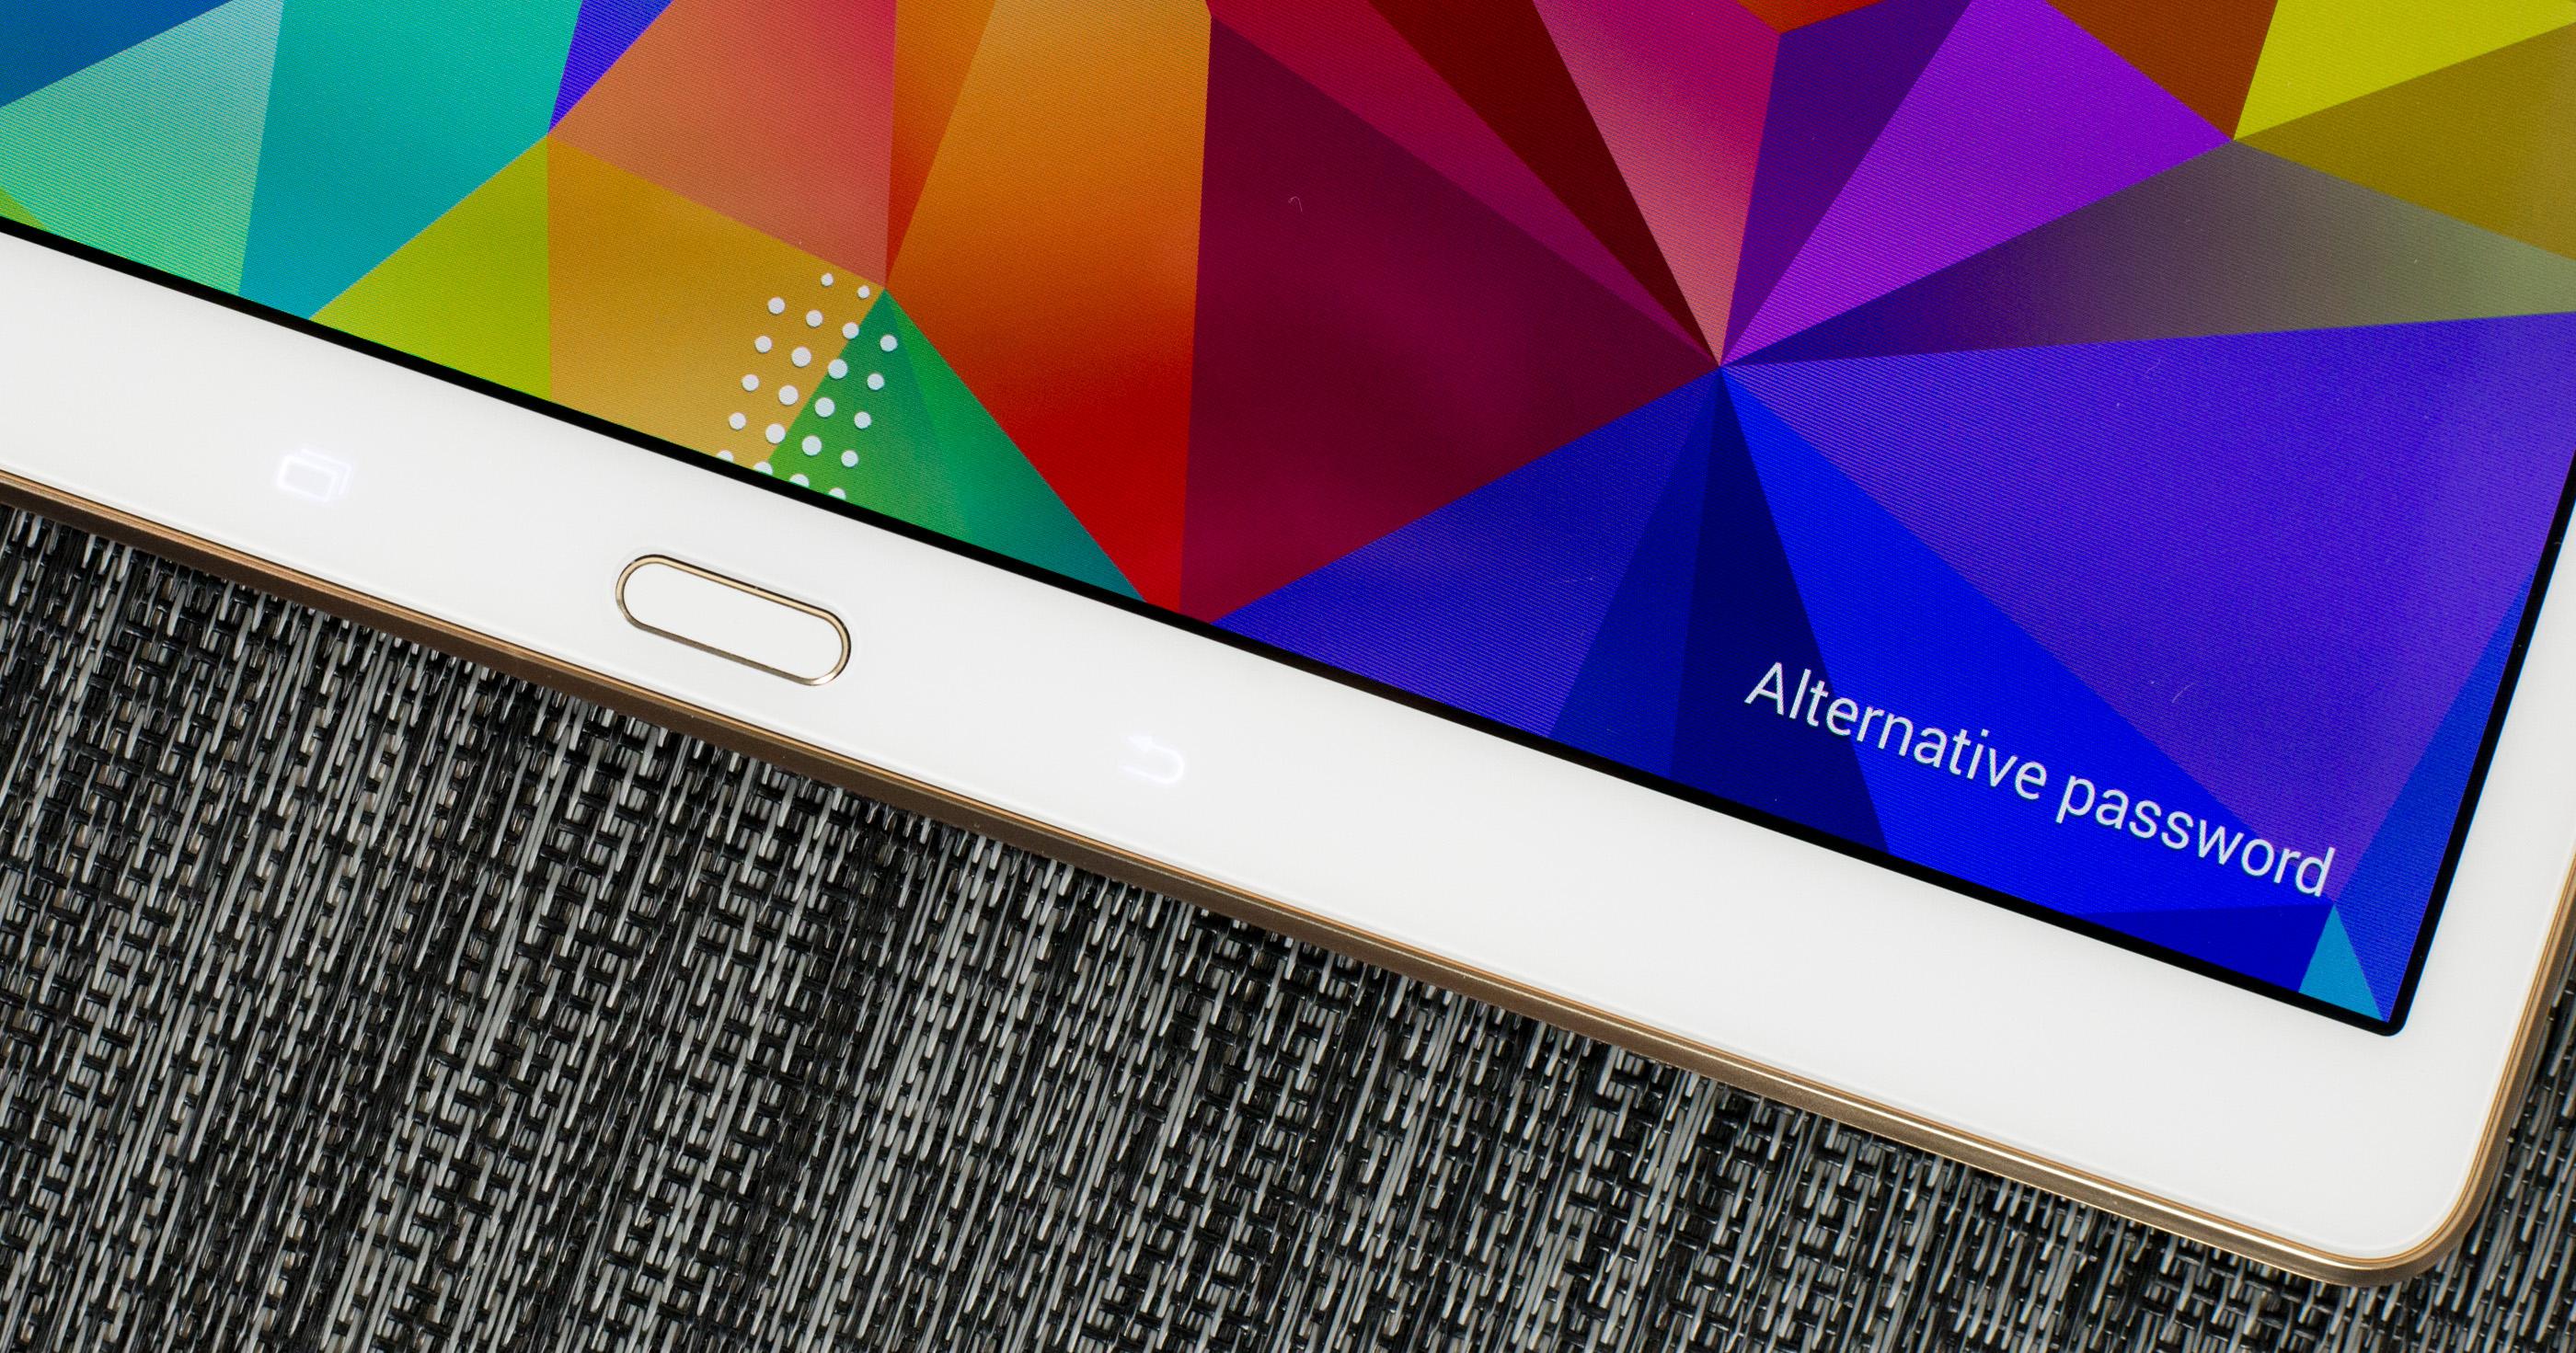 Samsung Galaxy Tab S Review (10 5 & 8 4-inch)